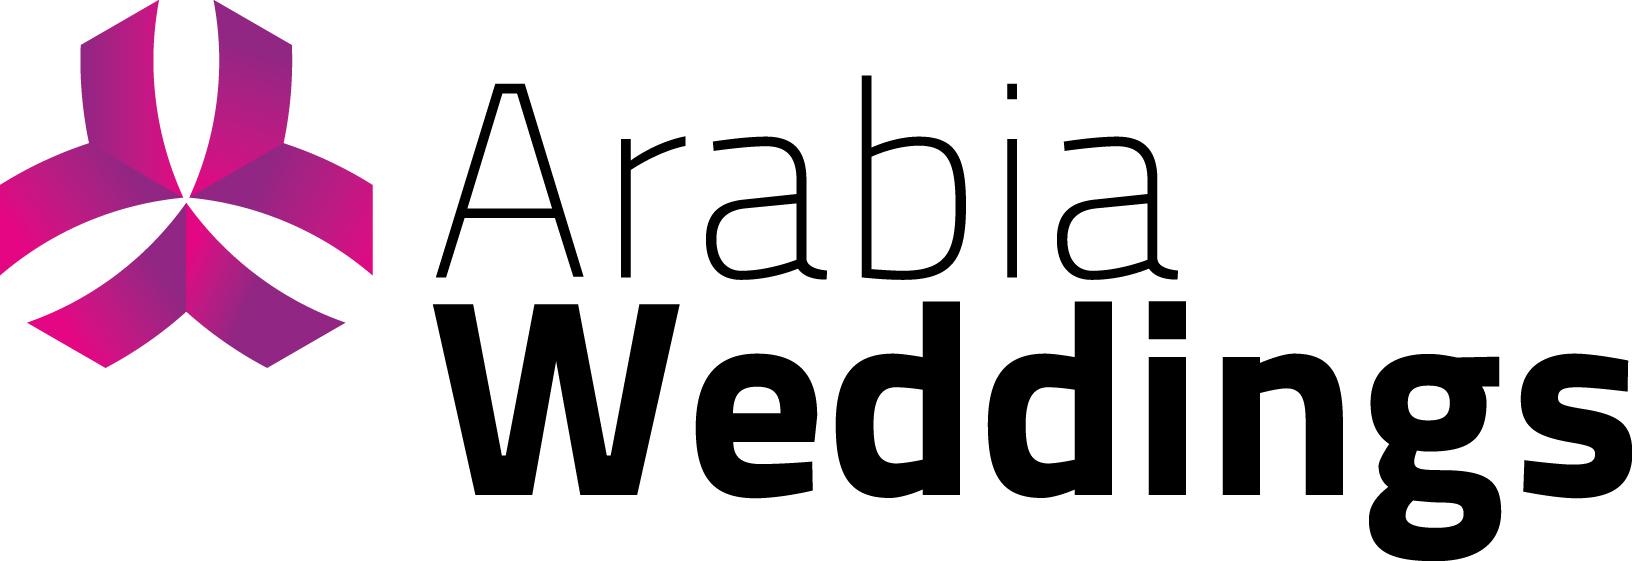 Arabia Weddings Reveals Results Of Wedding Planning Survey In Jordan